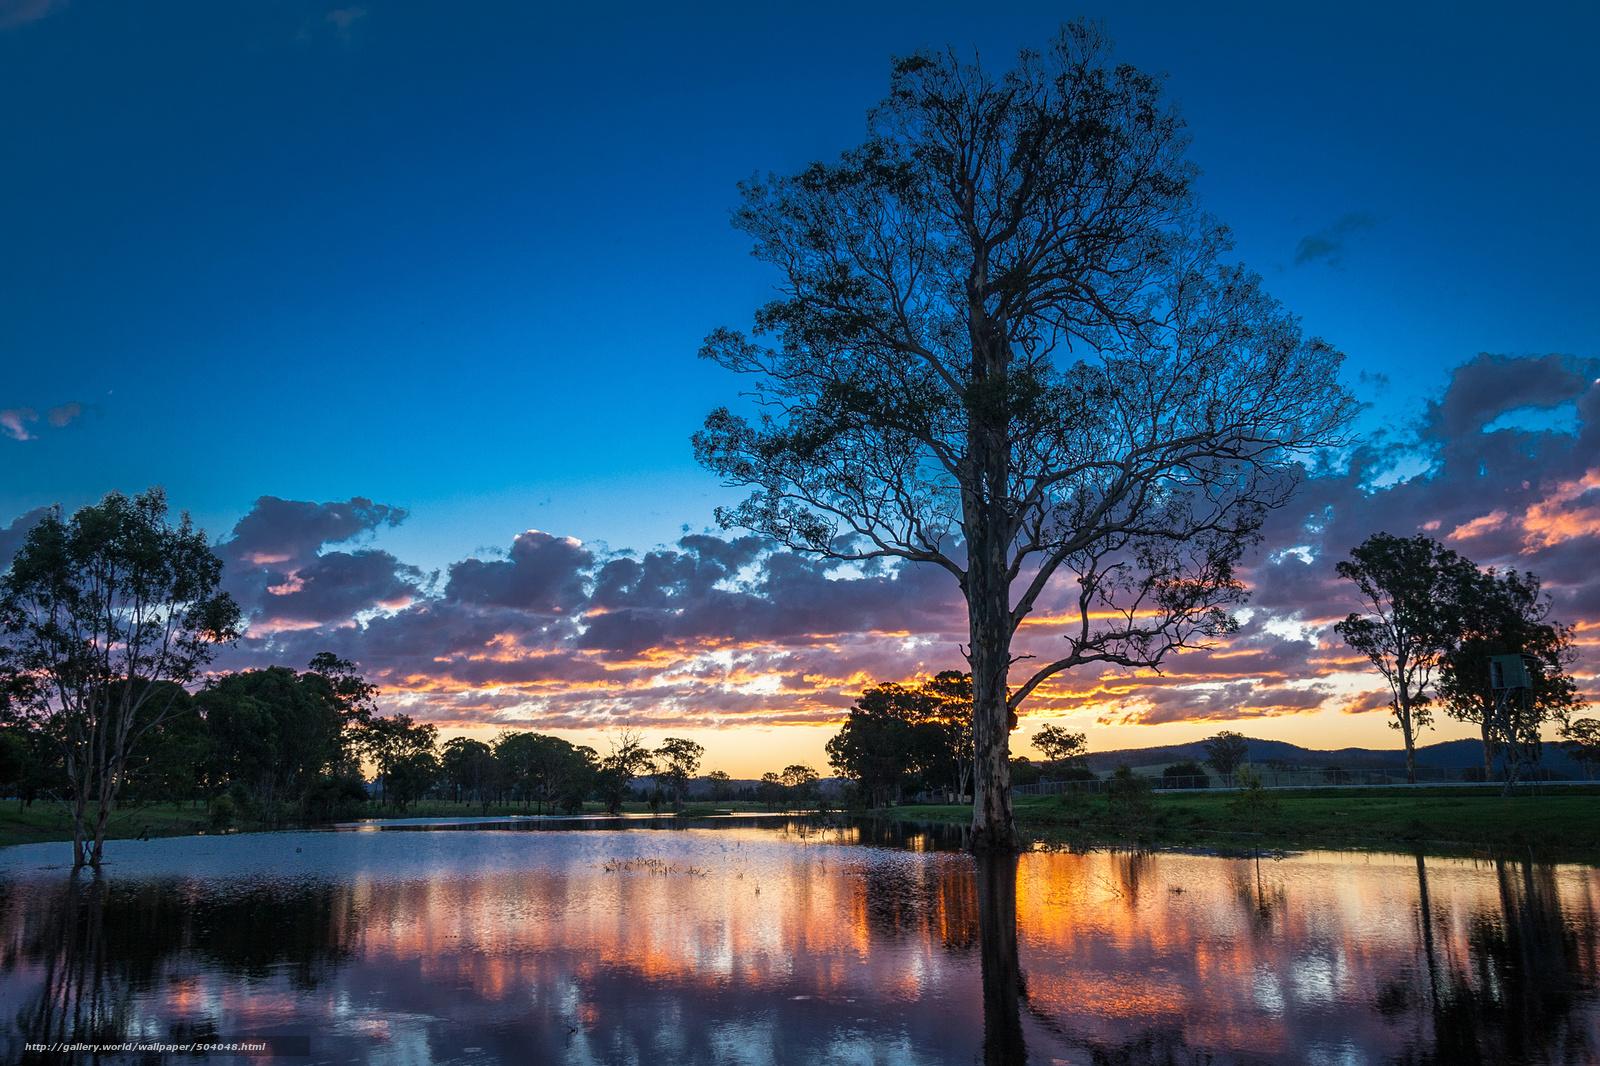 wallpaper australia Australia river sunset desktop wallpaper 1600x1066